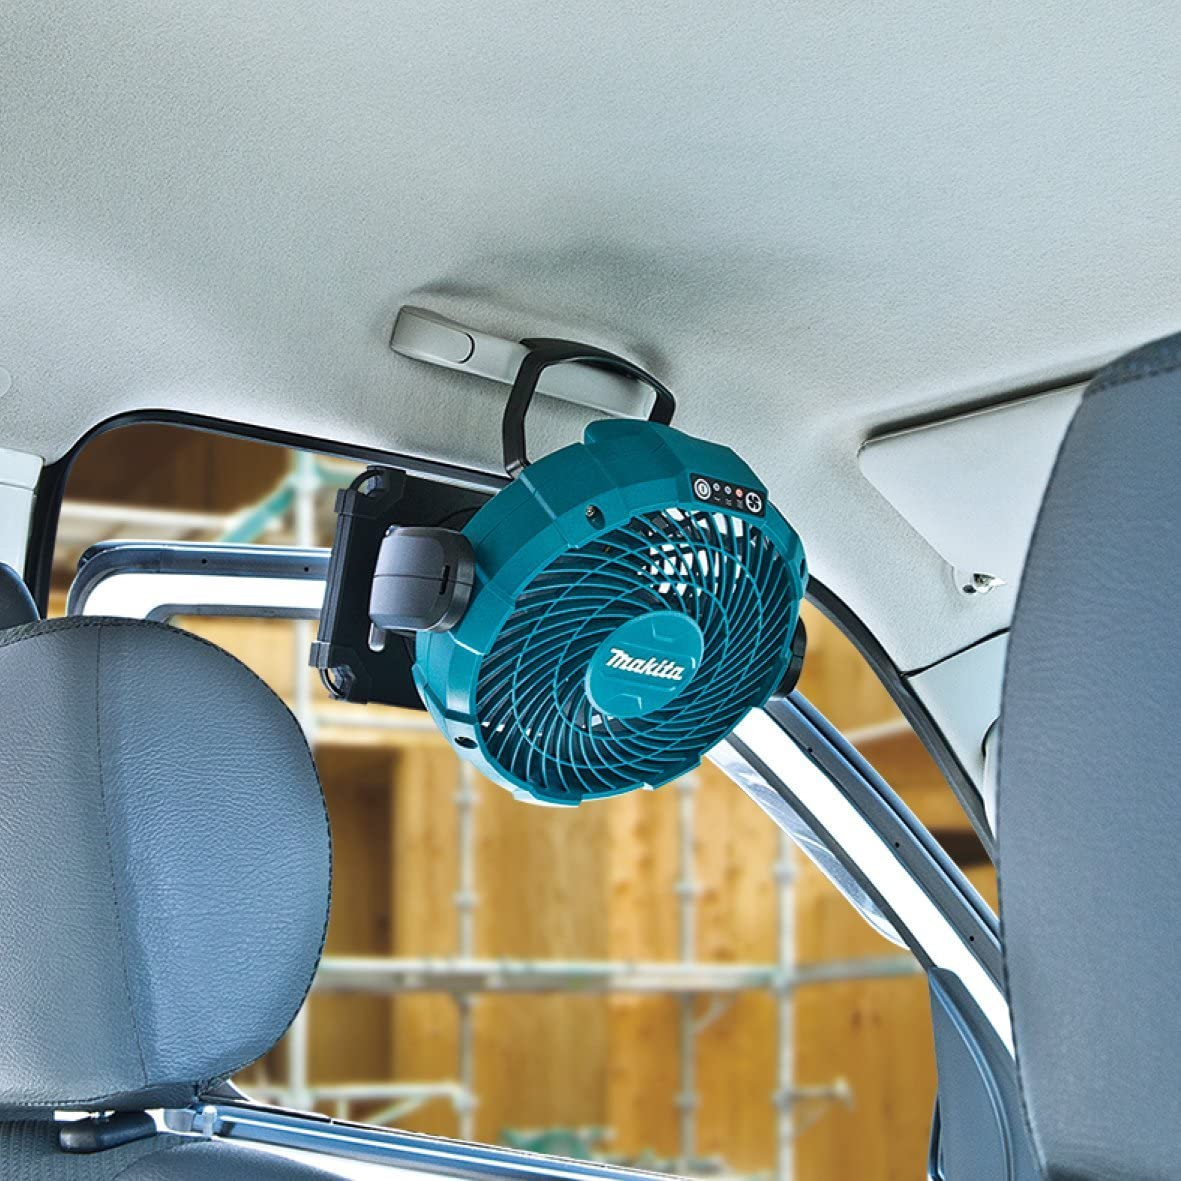 81K3eDEPJkL. AC SL1181  - 車中泊を快適に!扇風機の選び方とおすすめ4つを紹介